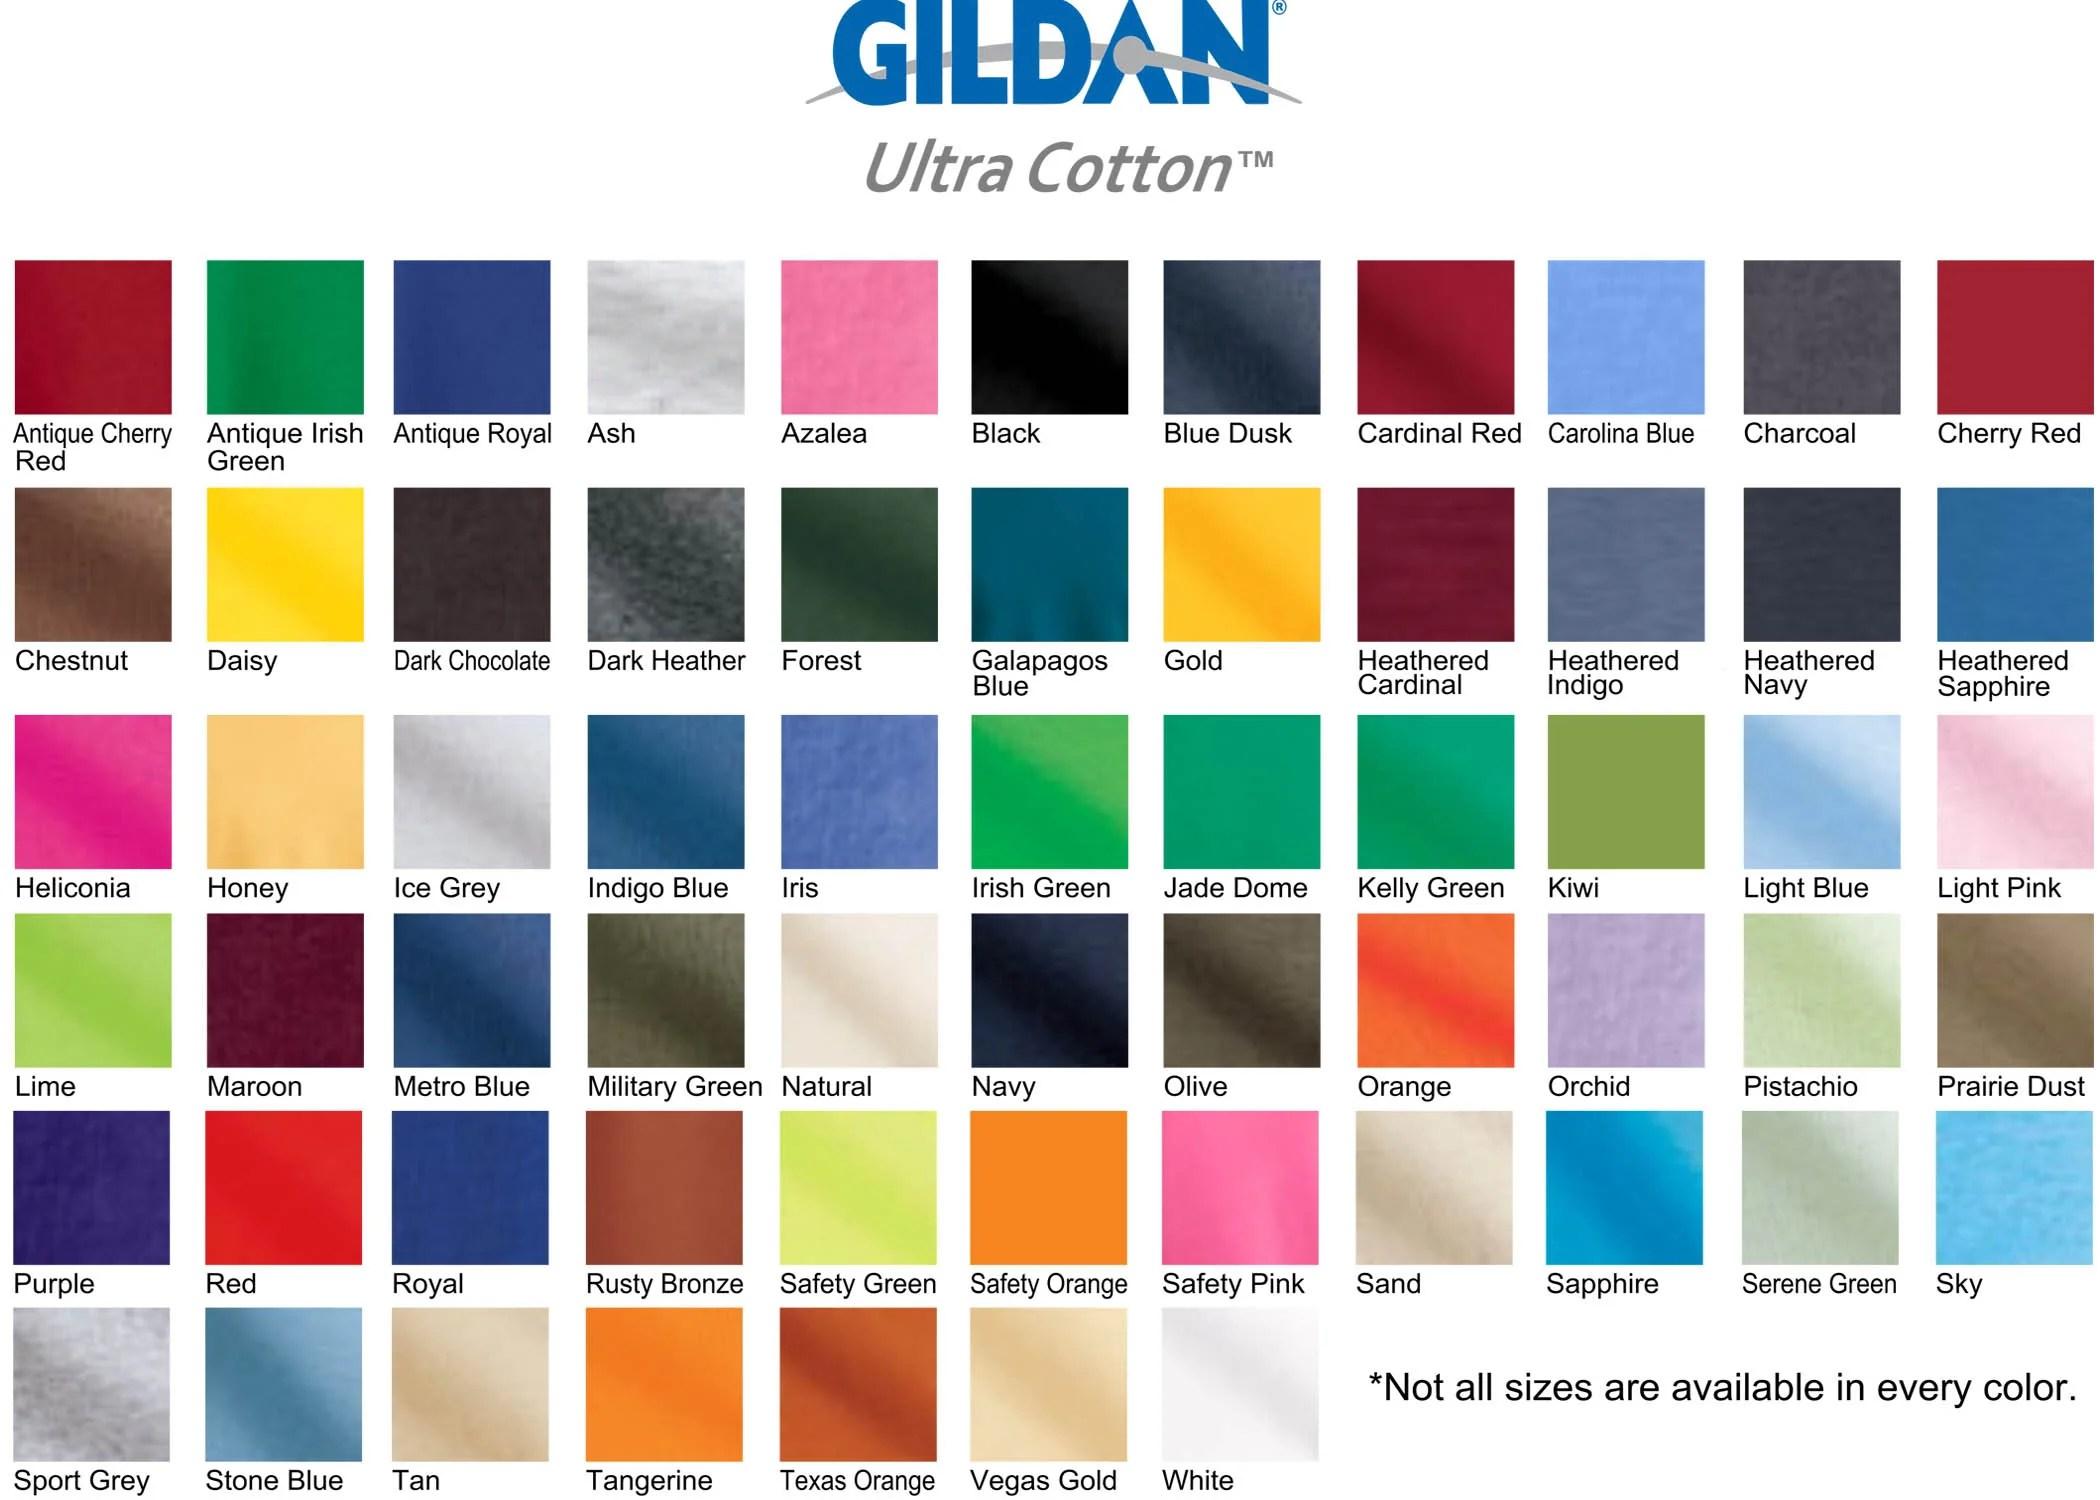 Gildan dryblend youth shirt size chart also joe maloy rh joetriathlon